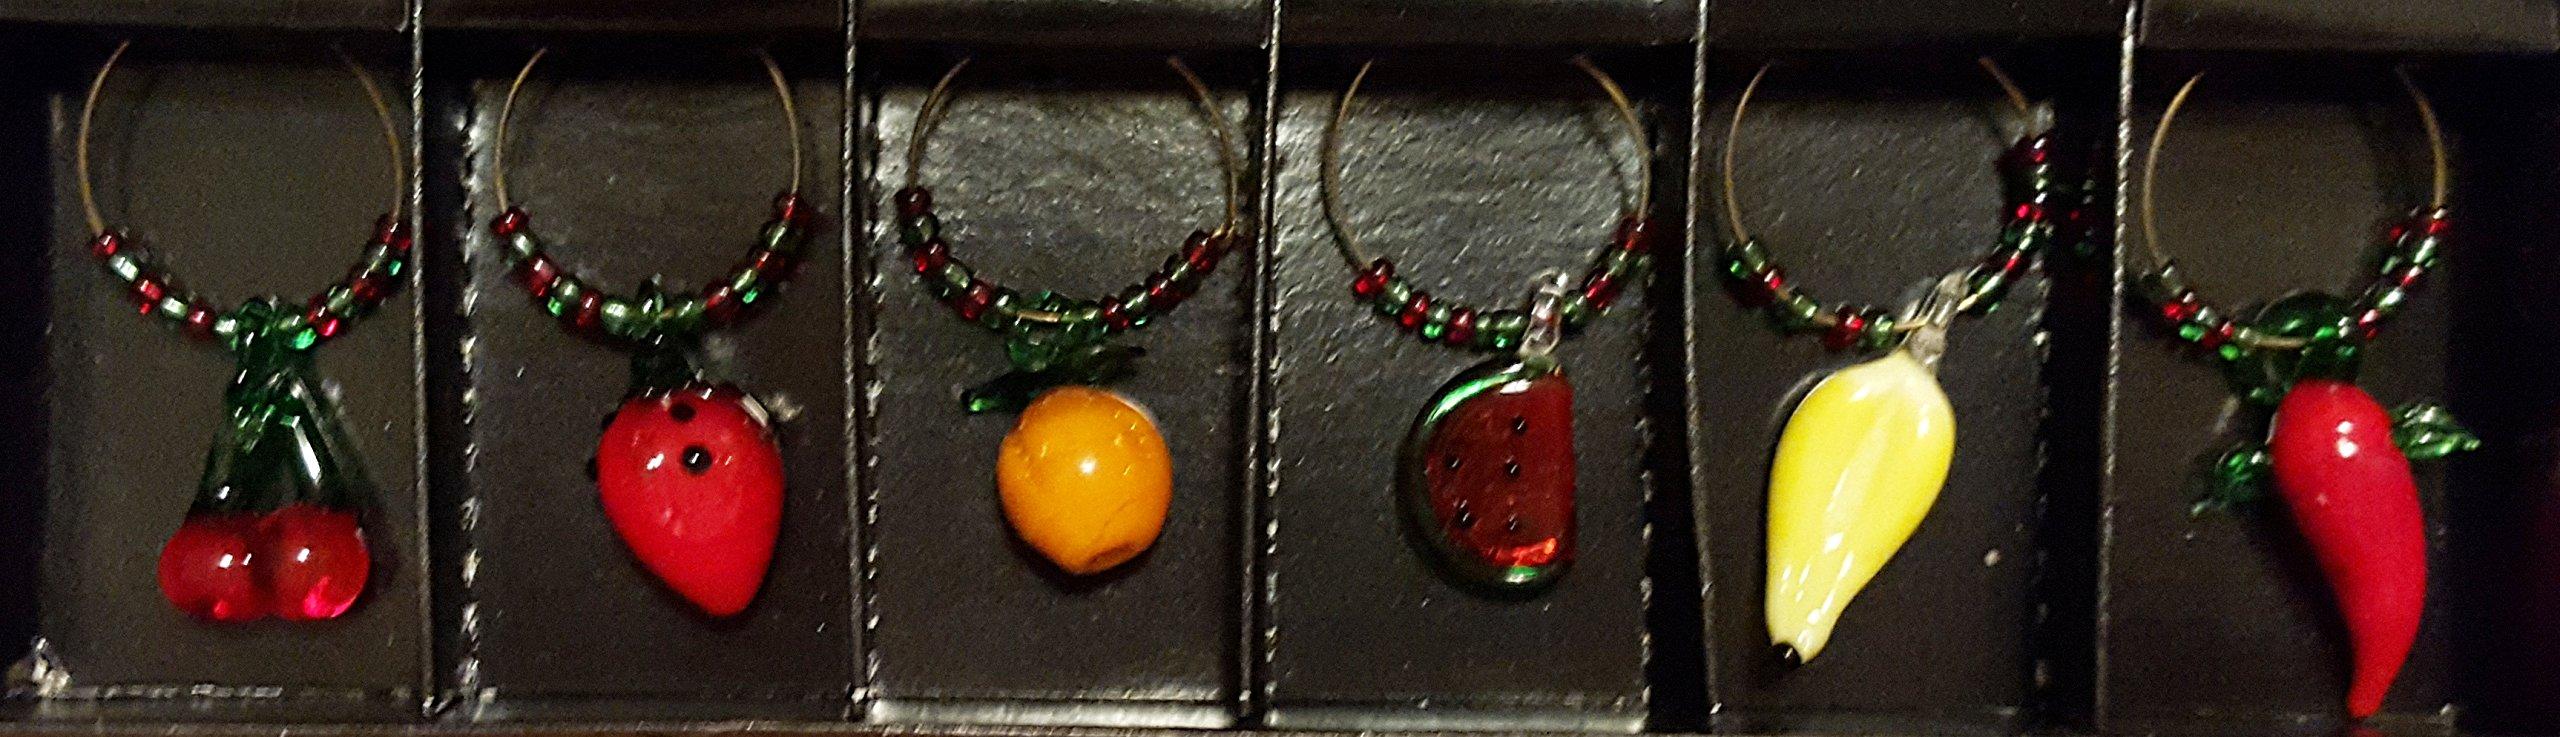 Glass Fruit Wine Charm Set by India Handicraft